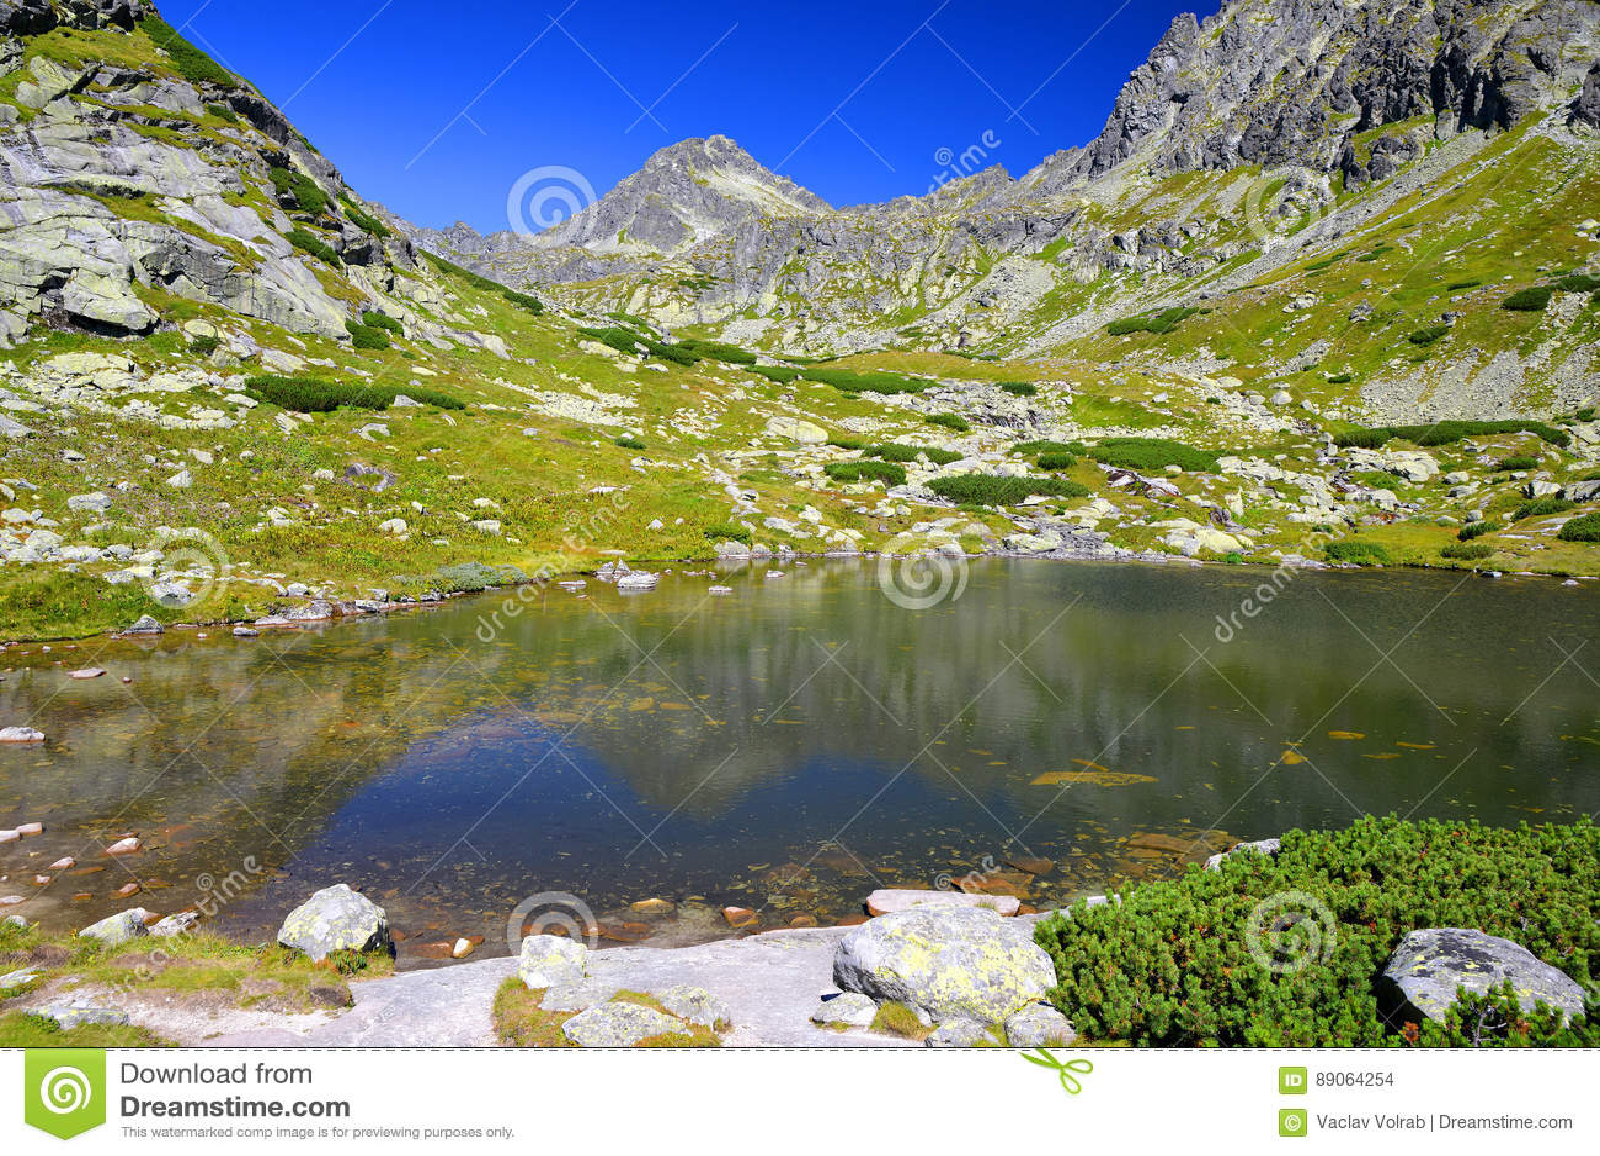 Pleso nad Skokom in Mlynicka Valley, Vysoke Tatry High Tatras, Slovakia